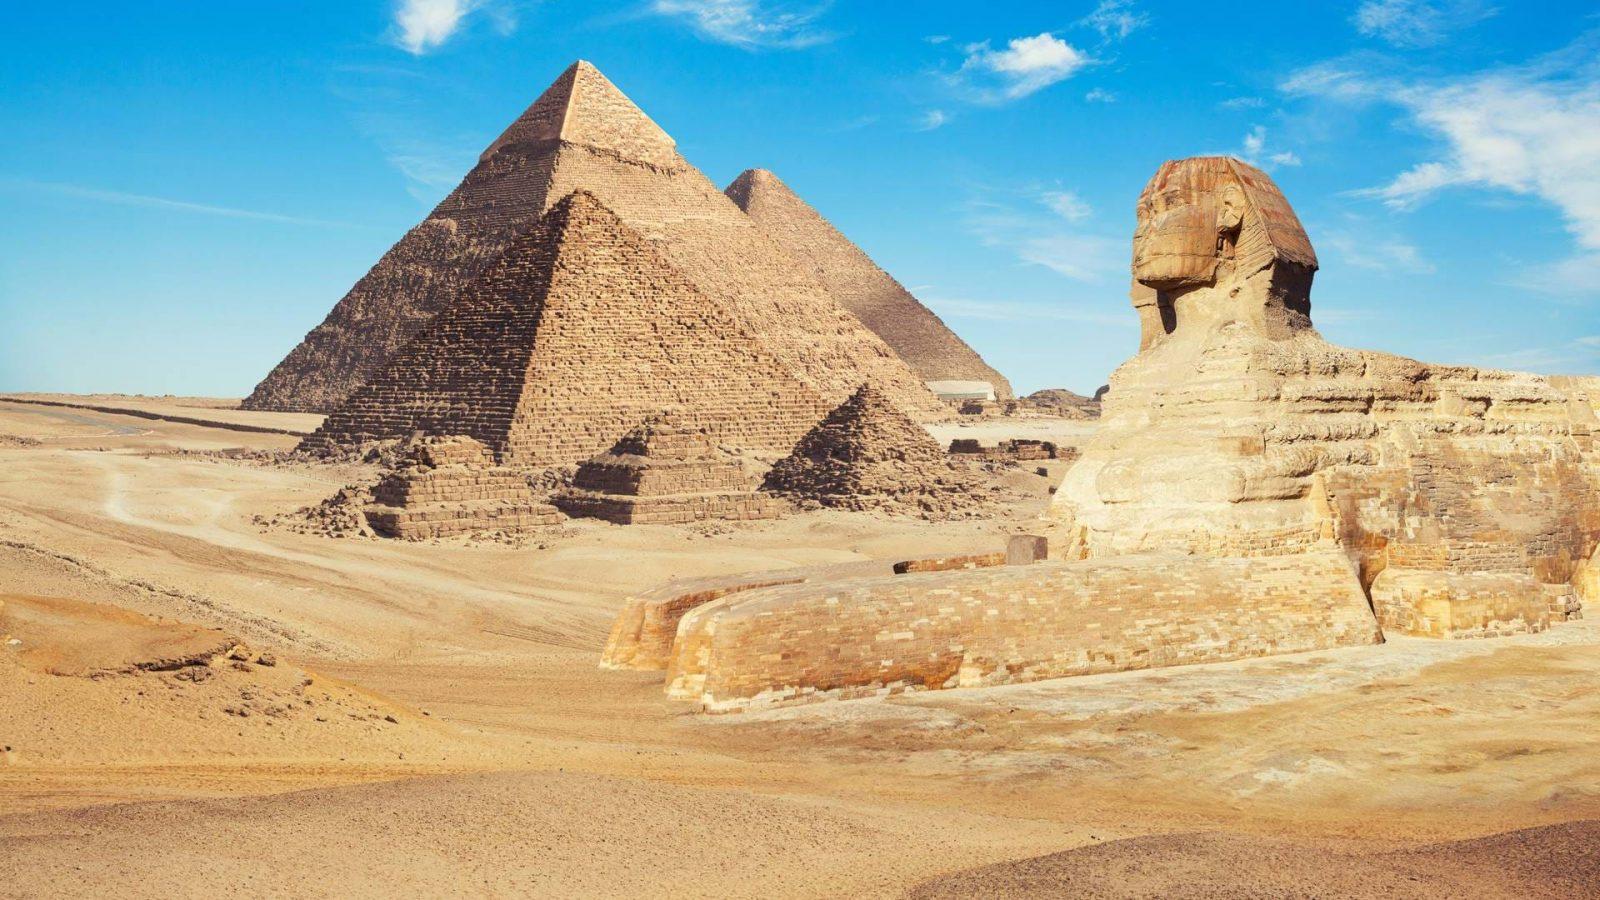 Egipat letovanje, leto egipat, egipat avionom, egipat hoteli allinclusive, olinkluziv